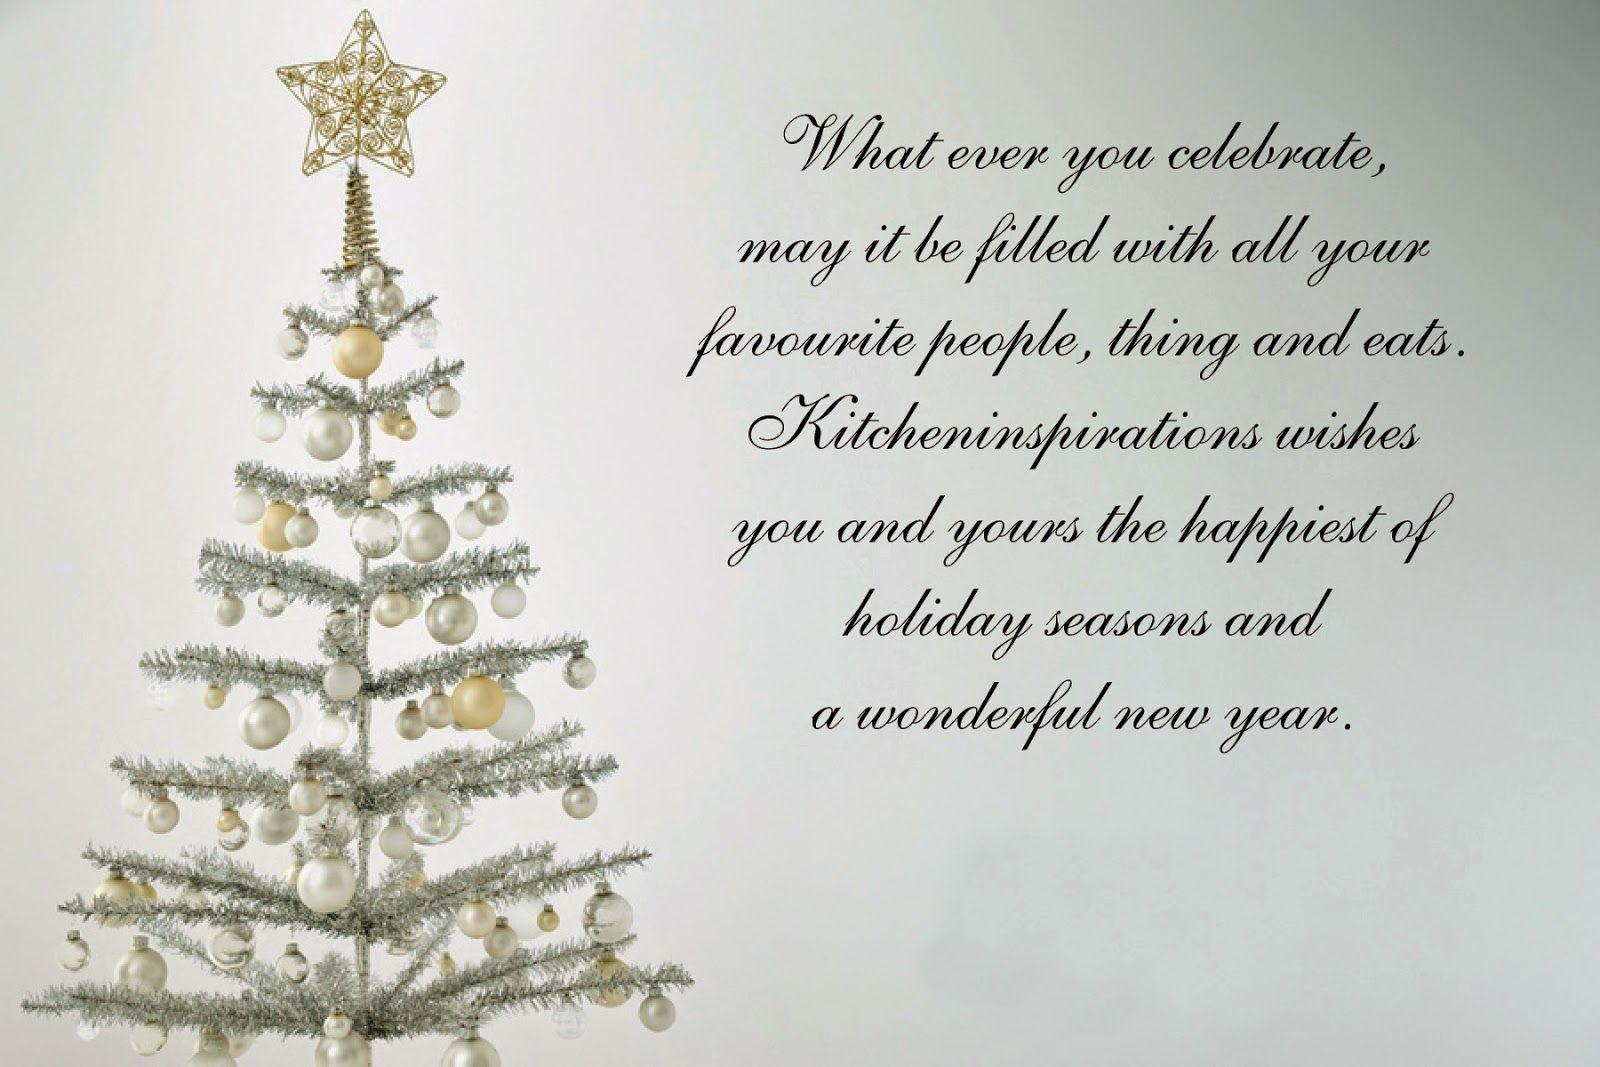 Christmas 2014 Card Verses Free Printable | Denise | Merry Christmas - Free Printable Christian Christmas Greeting Cards